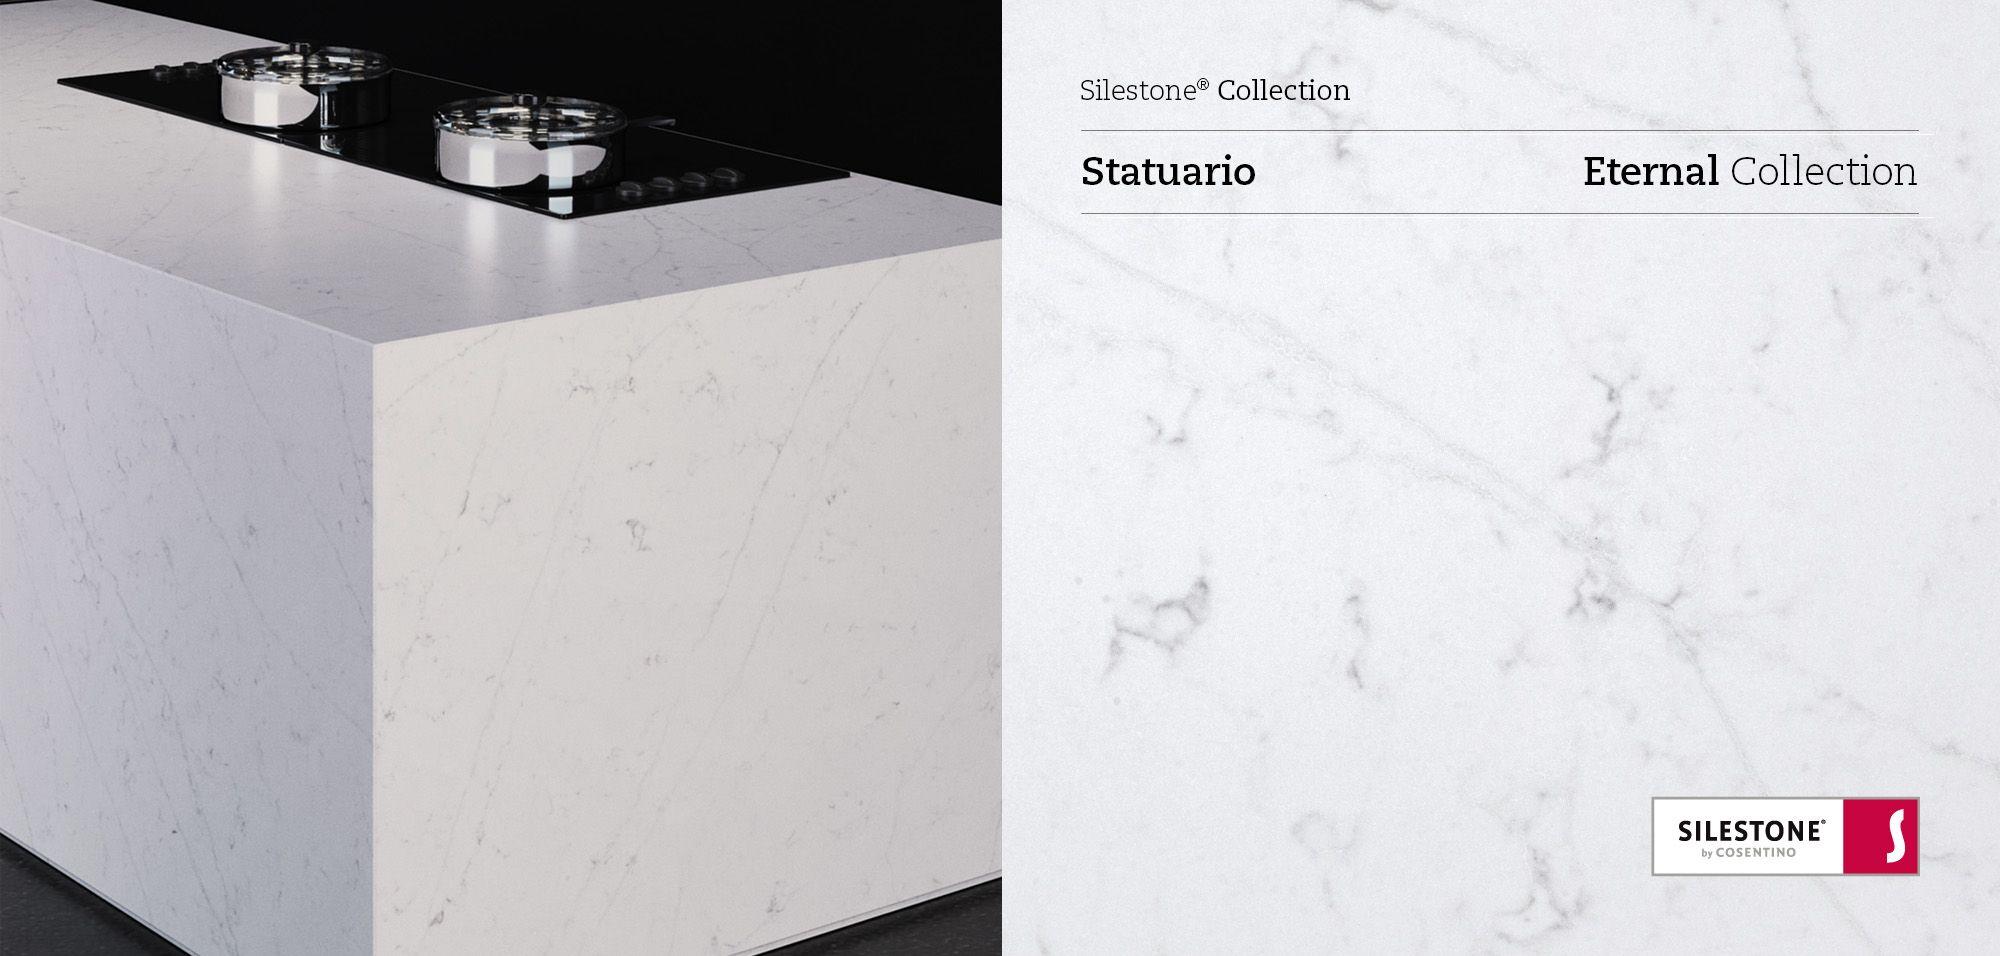 Et Statuario Silestone Quartz Sample Kitchen SIlestone Countertops